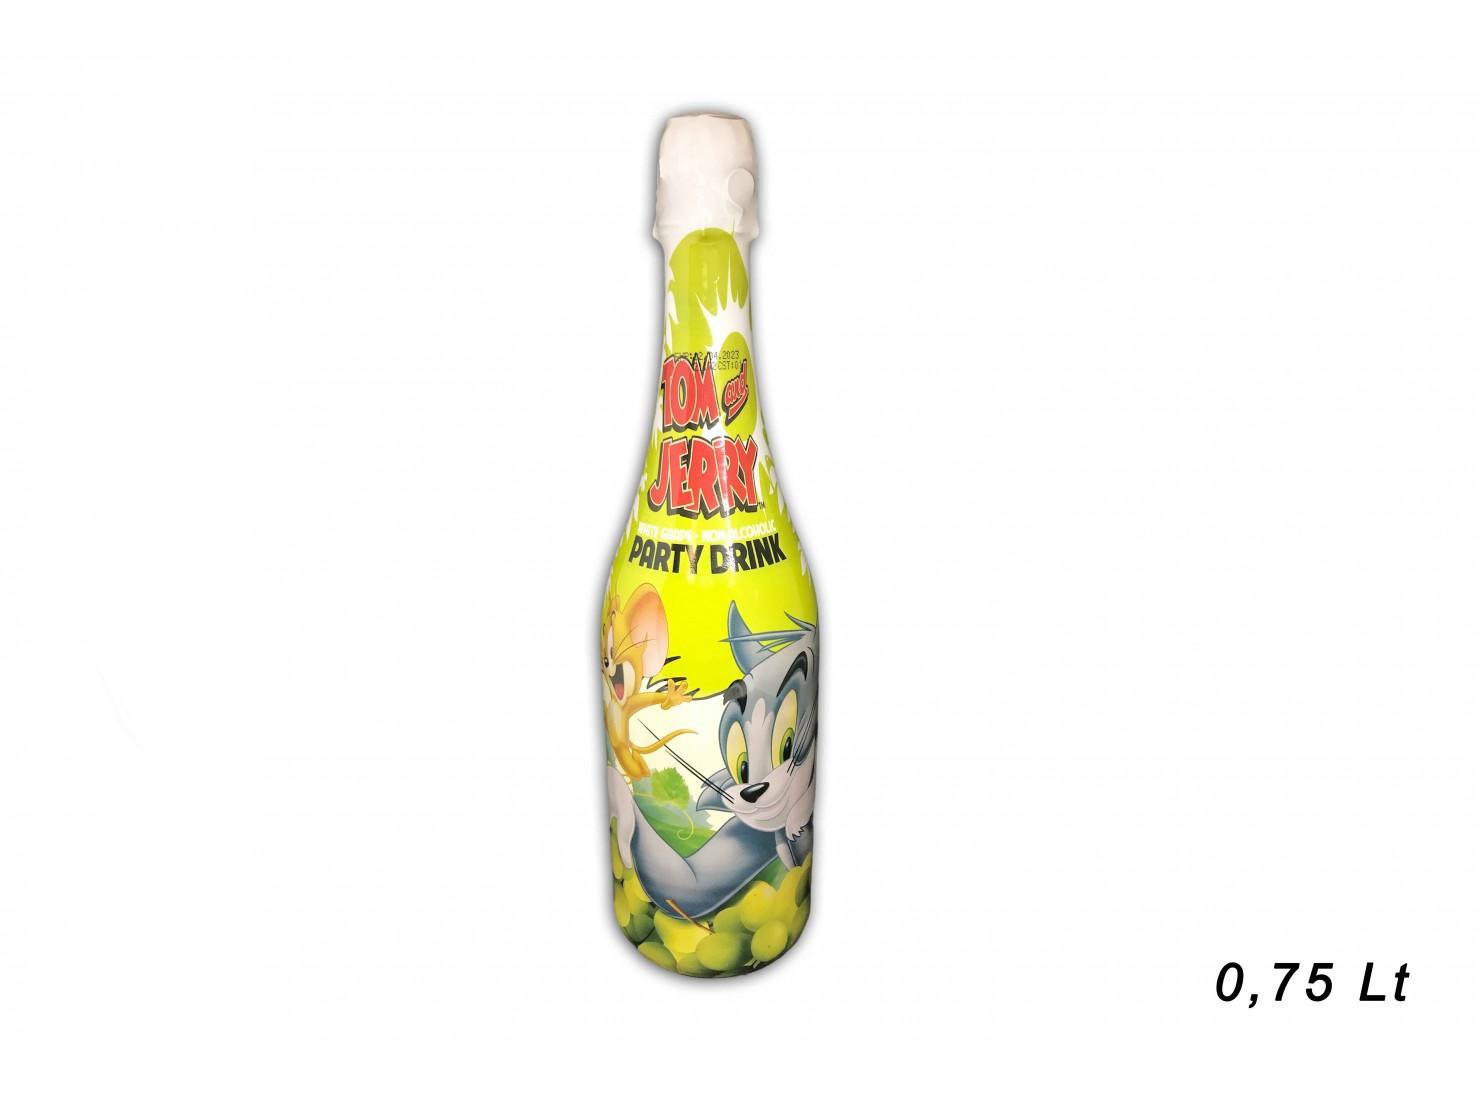 PARTY DRINK 0.75 LT TOM &...